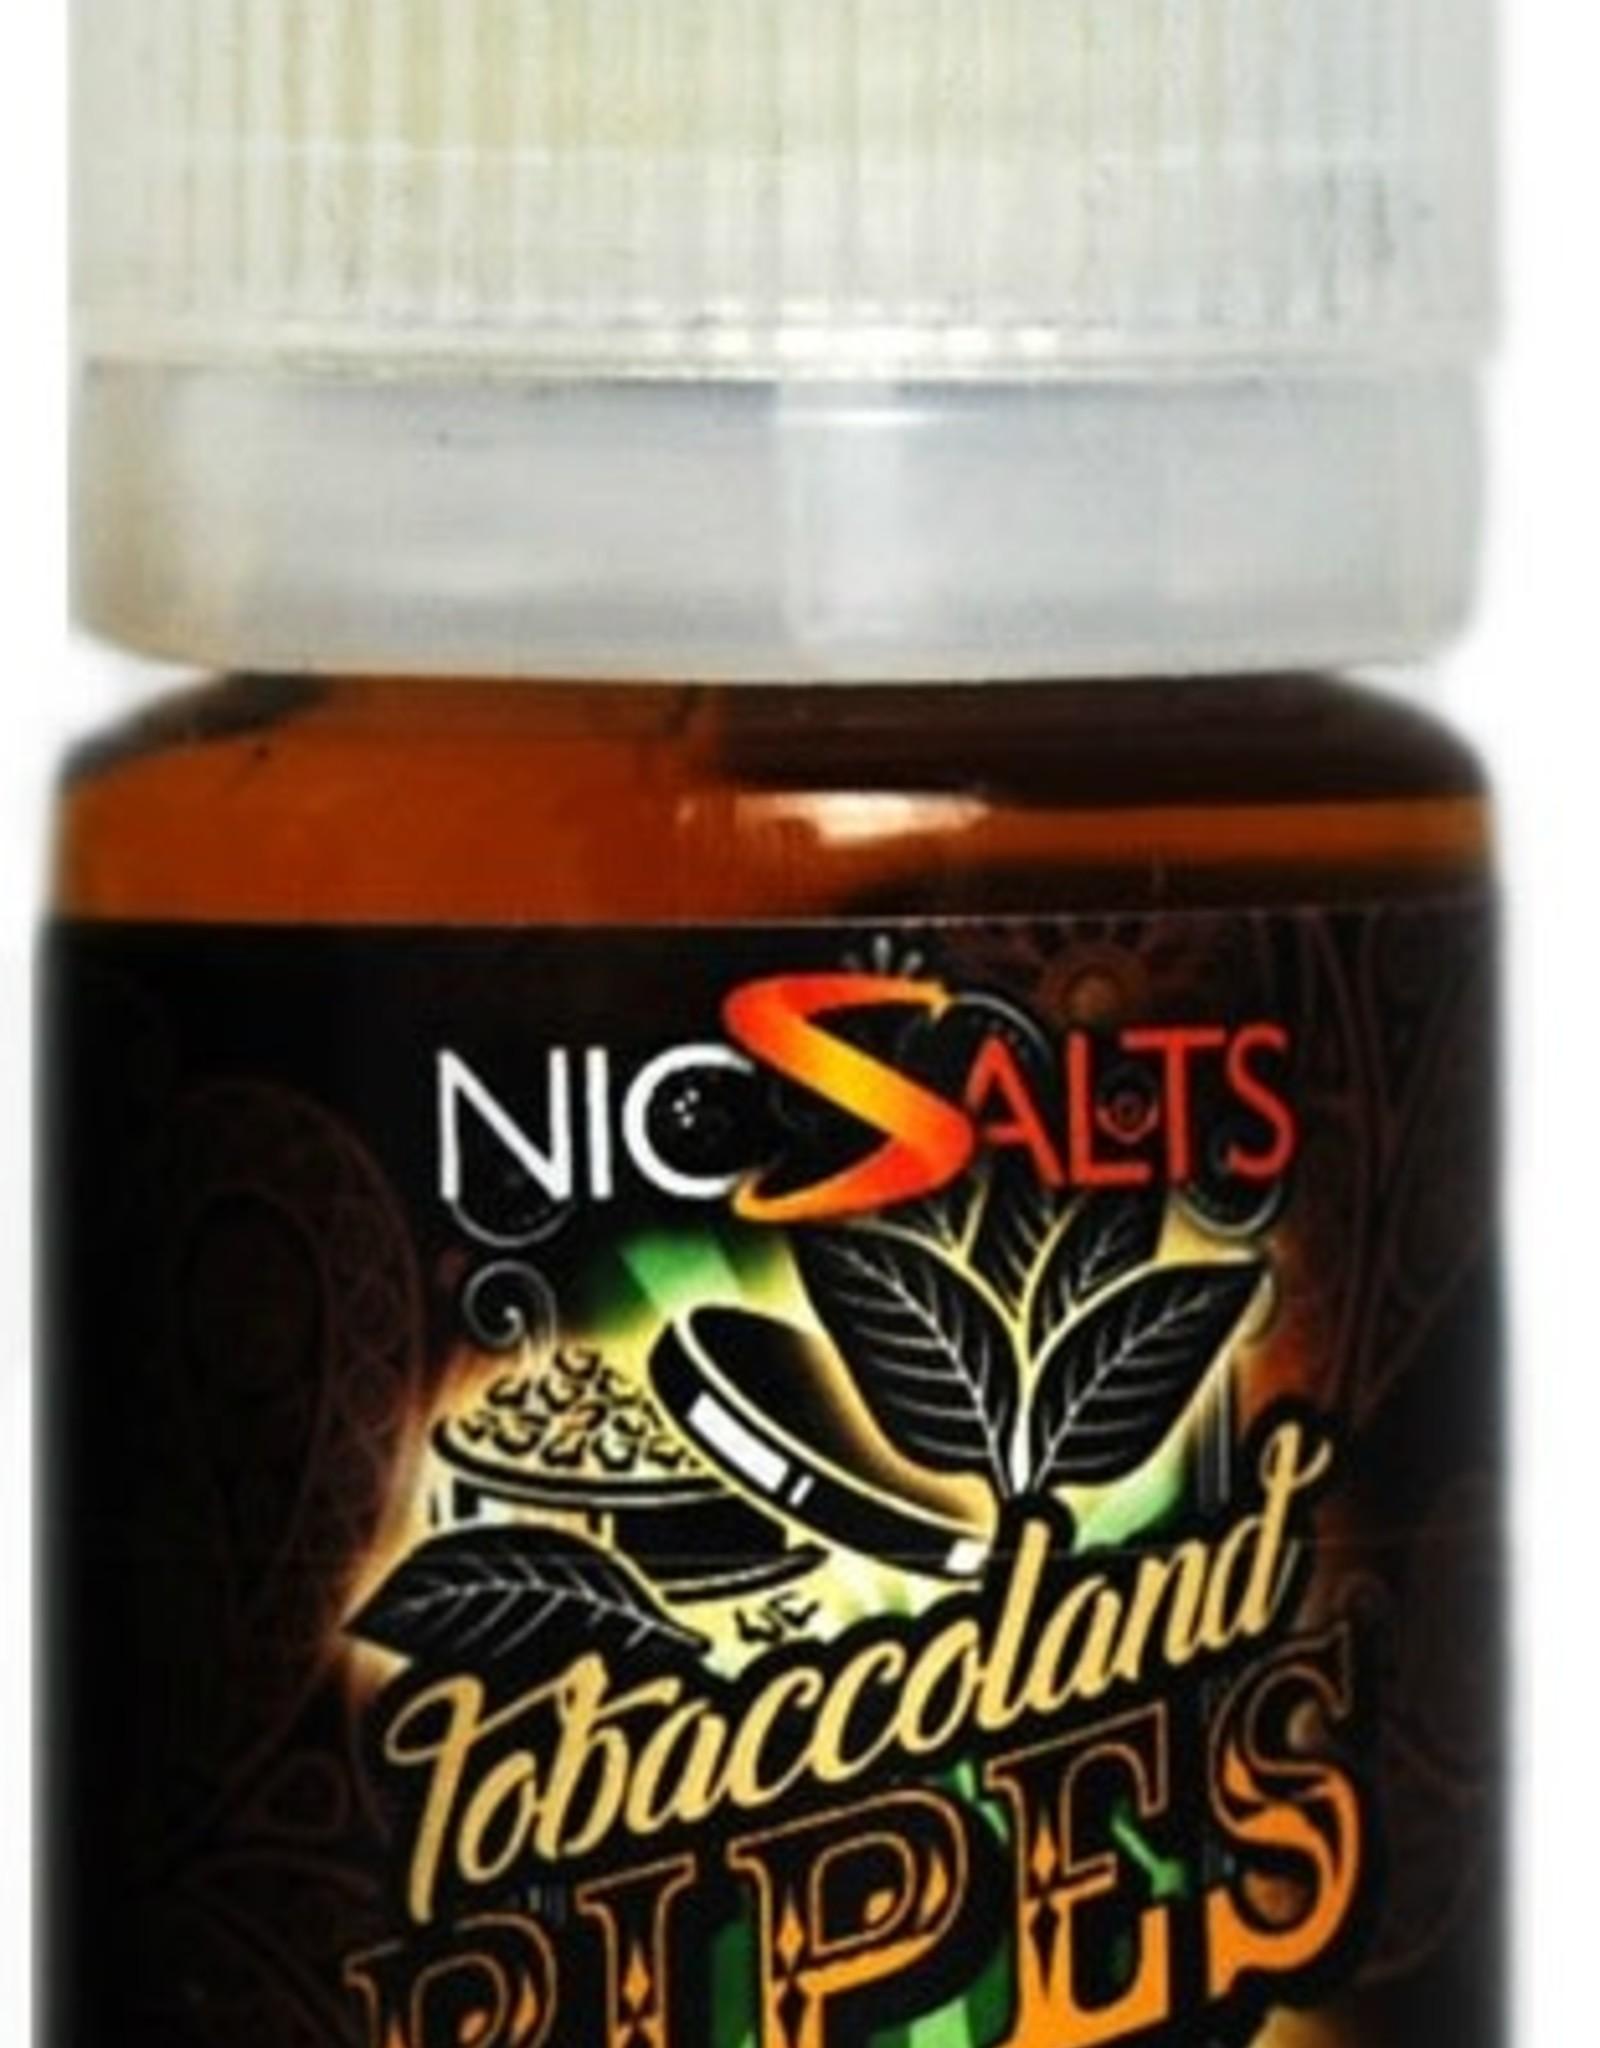 Tobaccoland Pipes Tobaccoland Cigar Series - Salt Nic